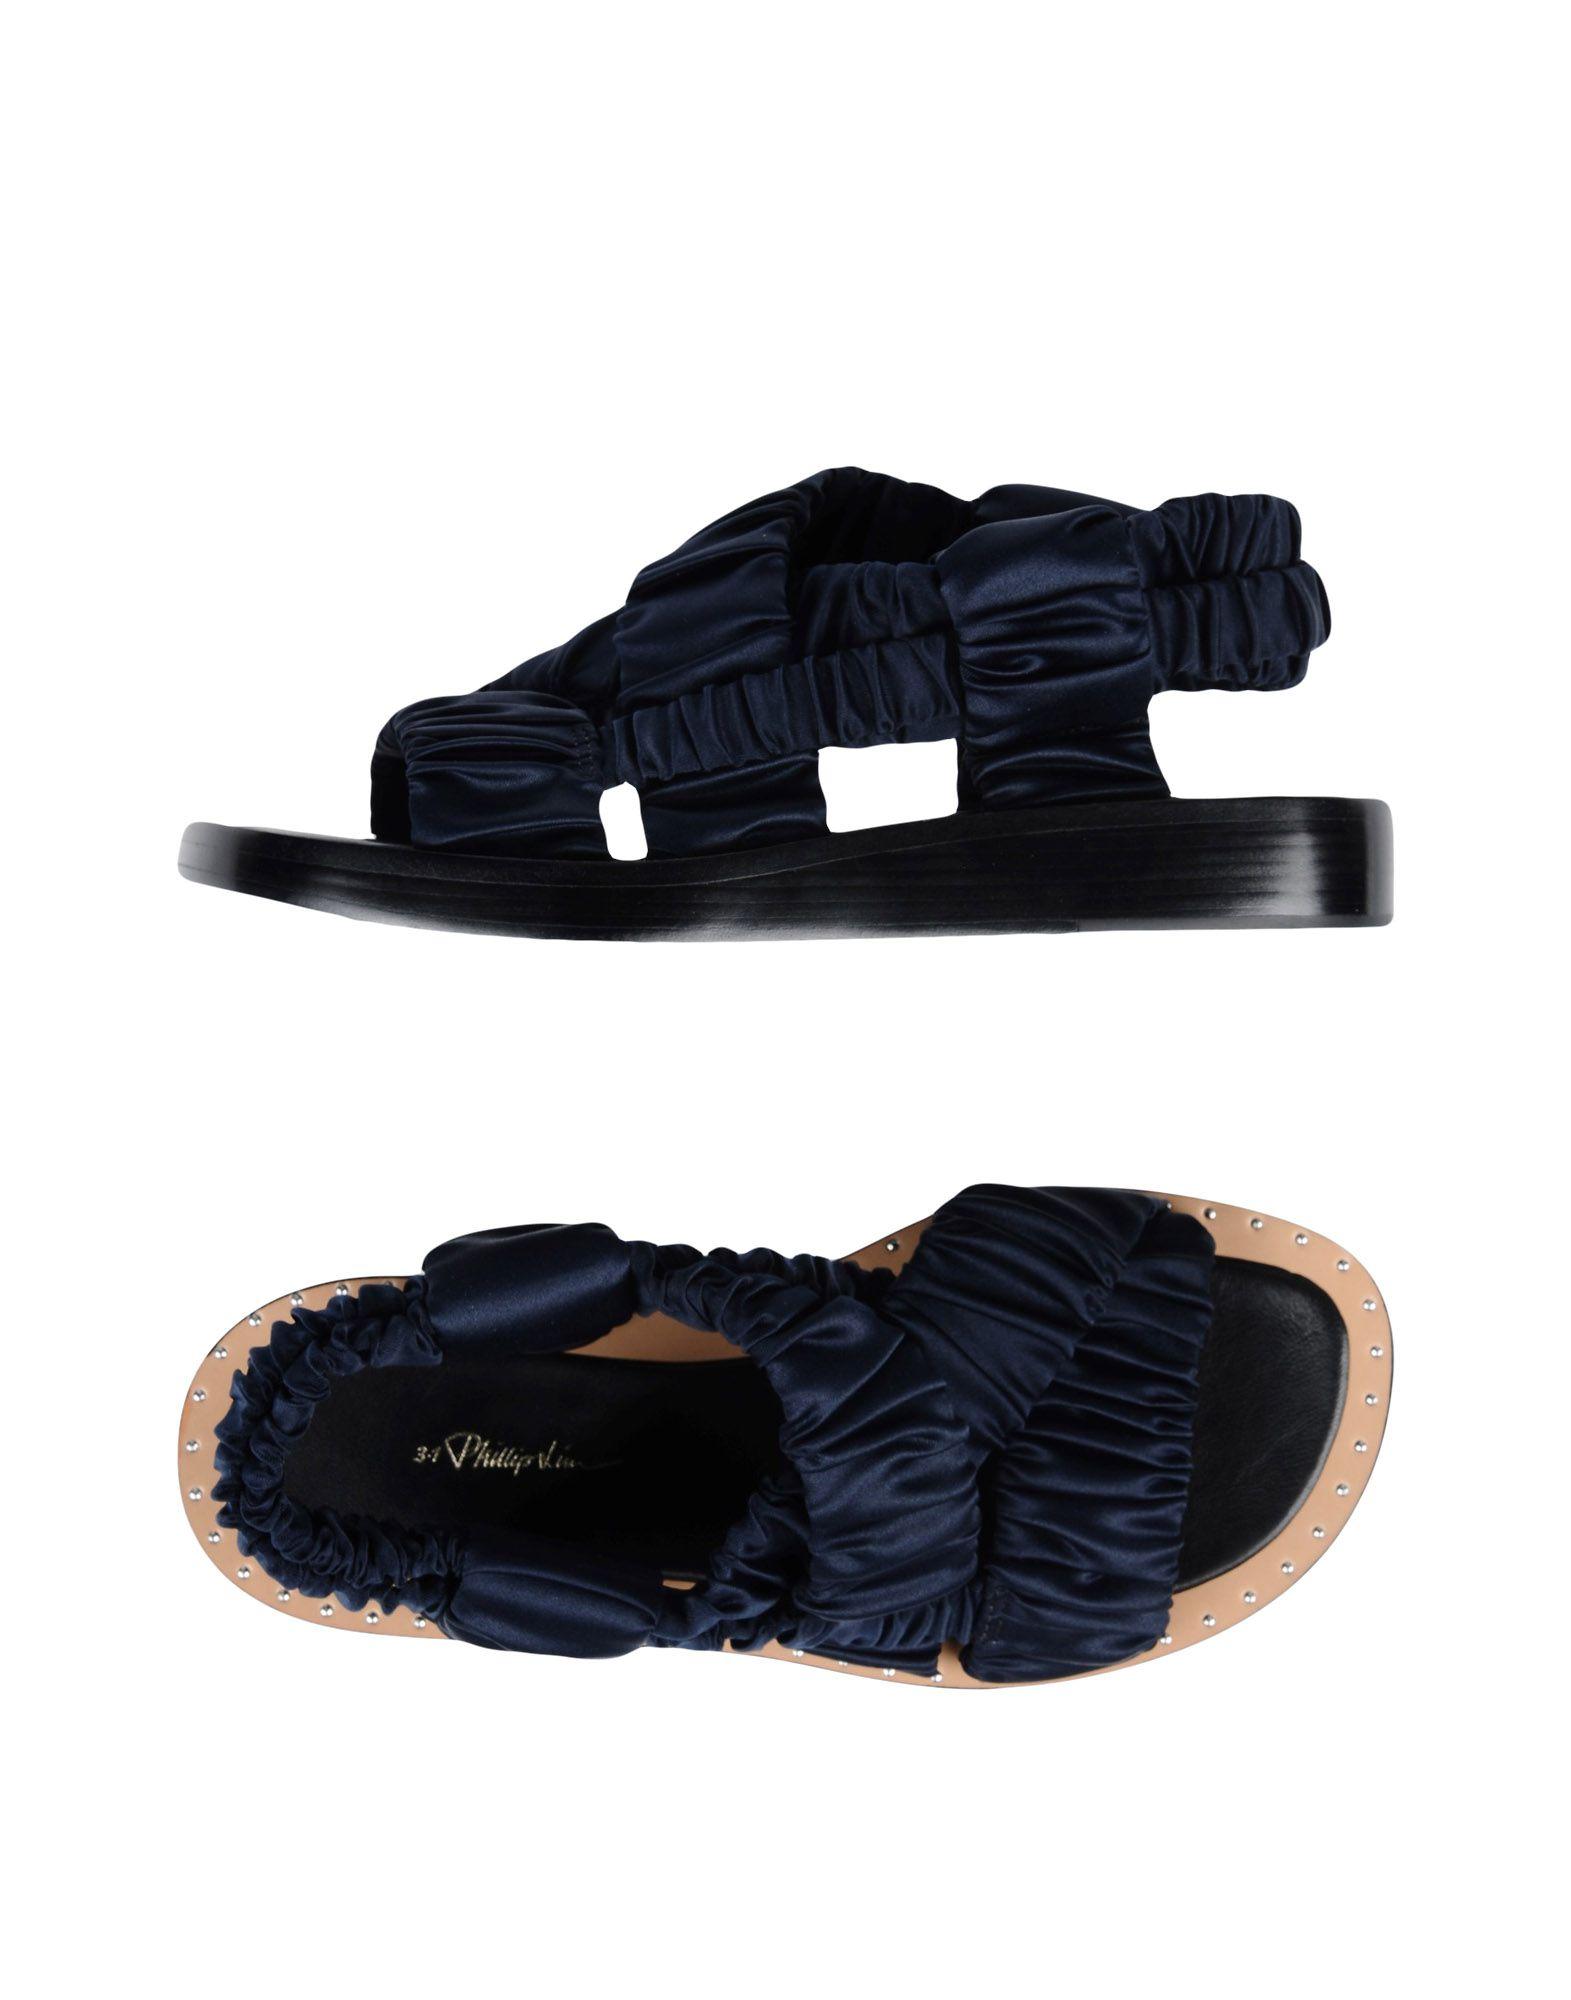 Stilvolle billige Schuhe 3.1 Phillip Lim Sandalen Damen  11423415AH